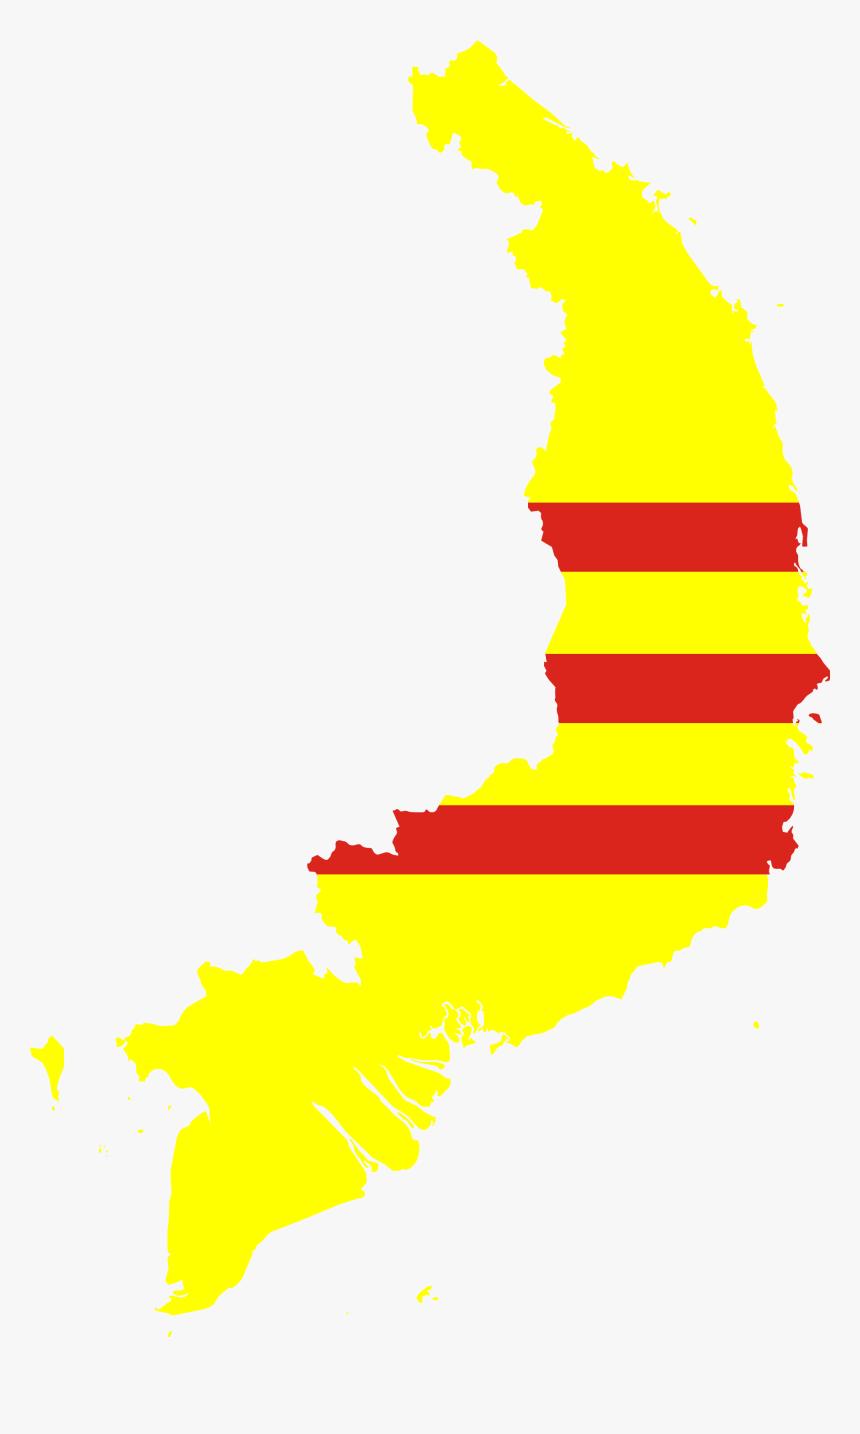 South Vietnam Flag Map Png Download South Vietnam Flag Map Transparent Png Kindpng